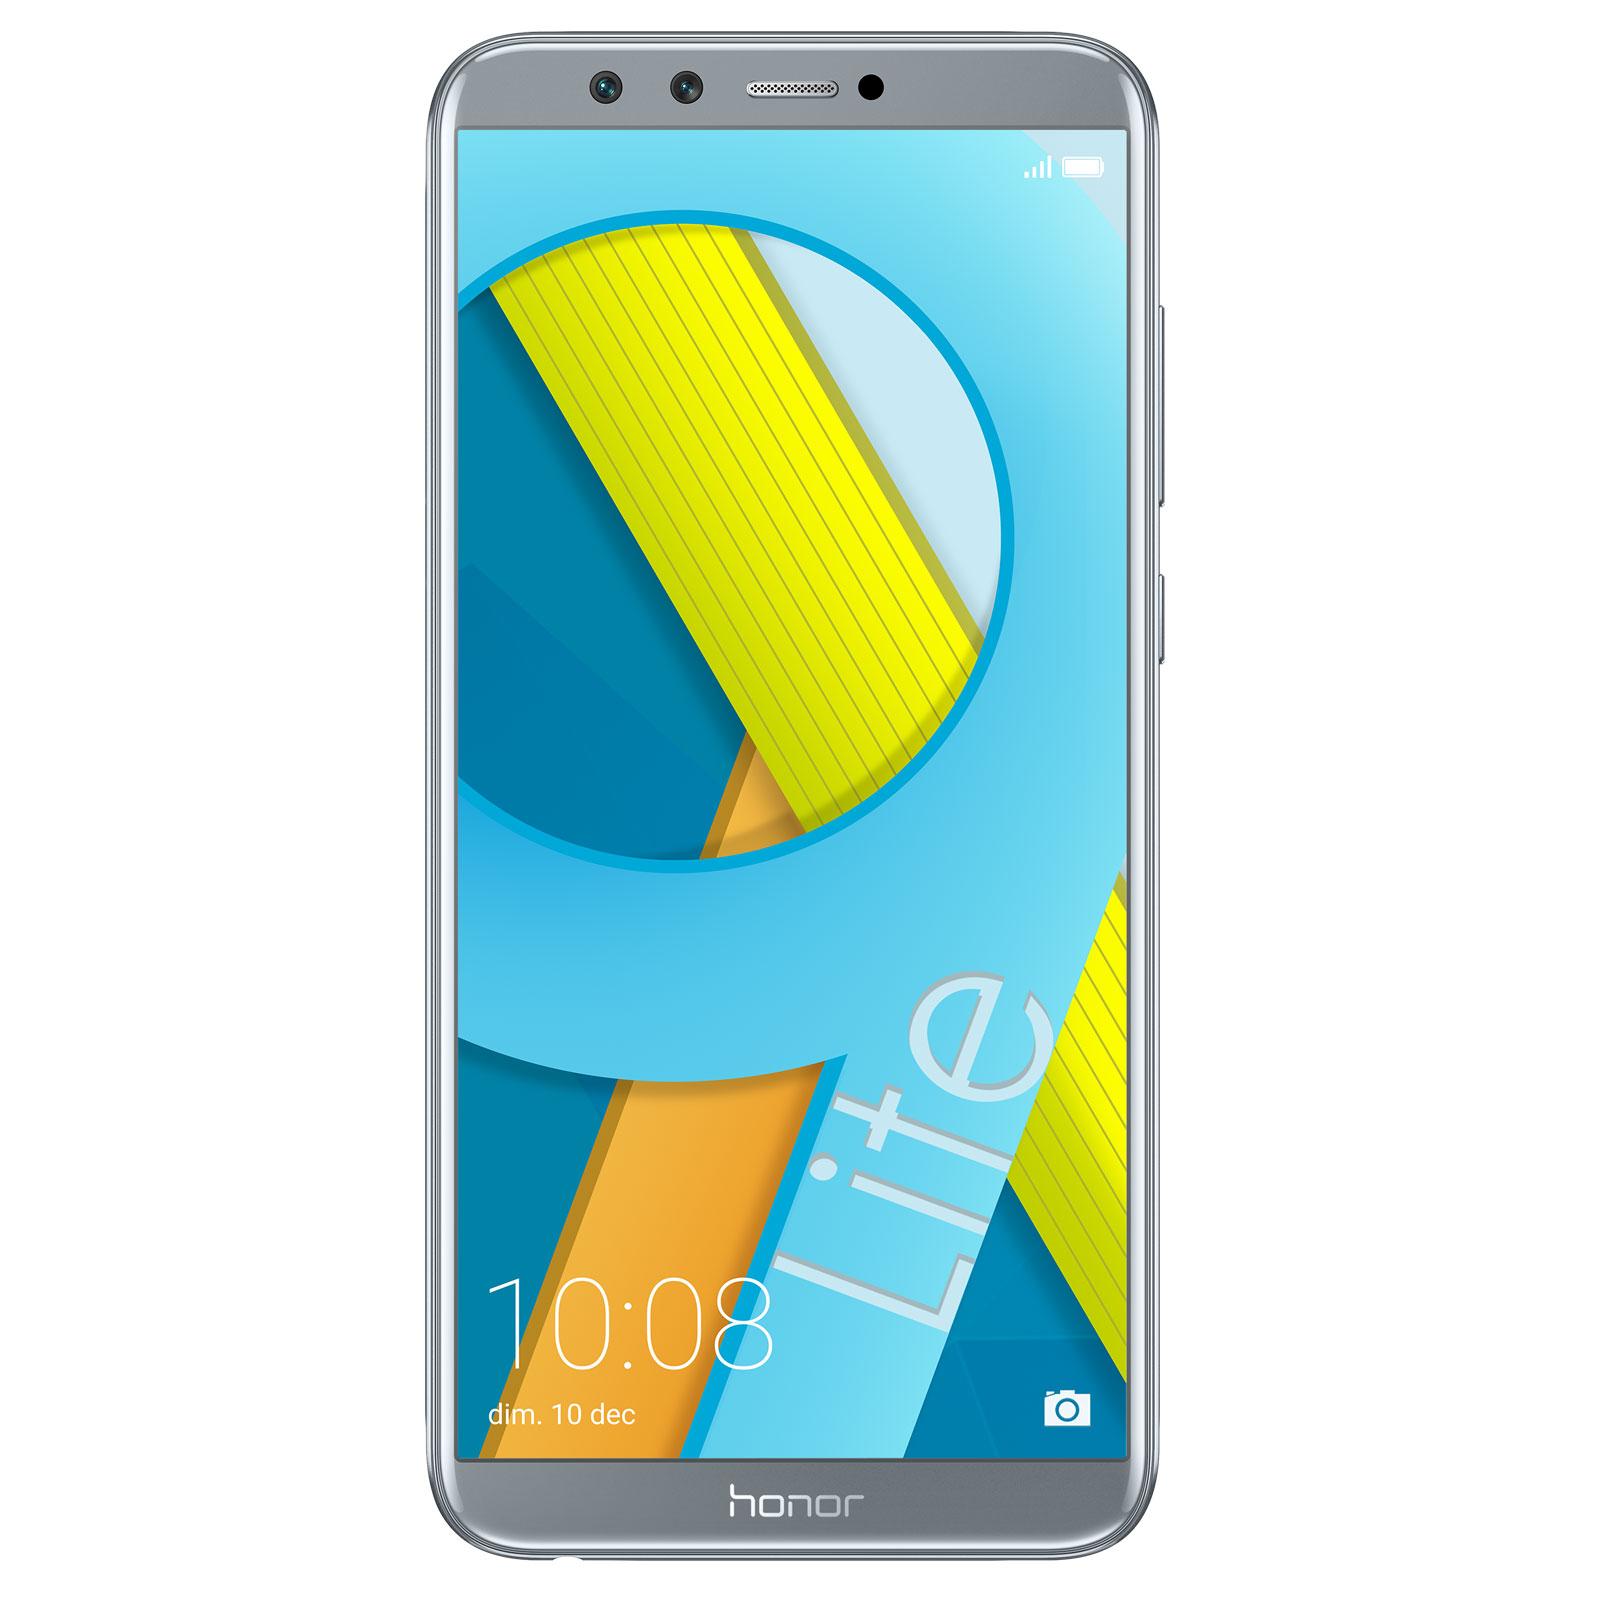 "Mobile & smartphone Honor 9 Lite Gris (4 Go / 64 Go) Smartphone 4G-LTE Dual SIM - Kirin 659 8-Core 2,36 GHz - RAM 4 Go - Ecran tactile 5.65"" 1080 x 2160 - 64 Go - NFC/Bluetooth 4.2 - 3000 mAh - Android 8.0"